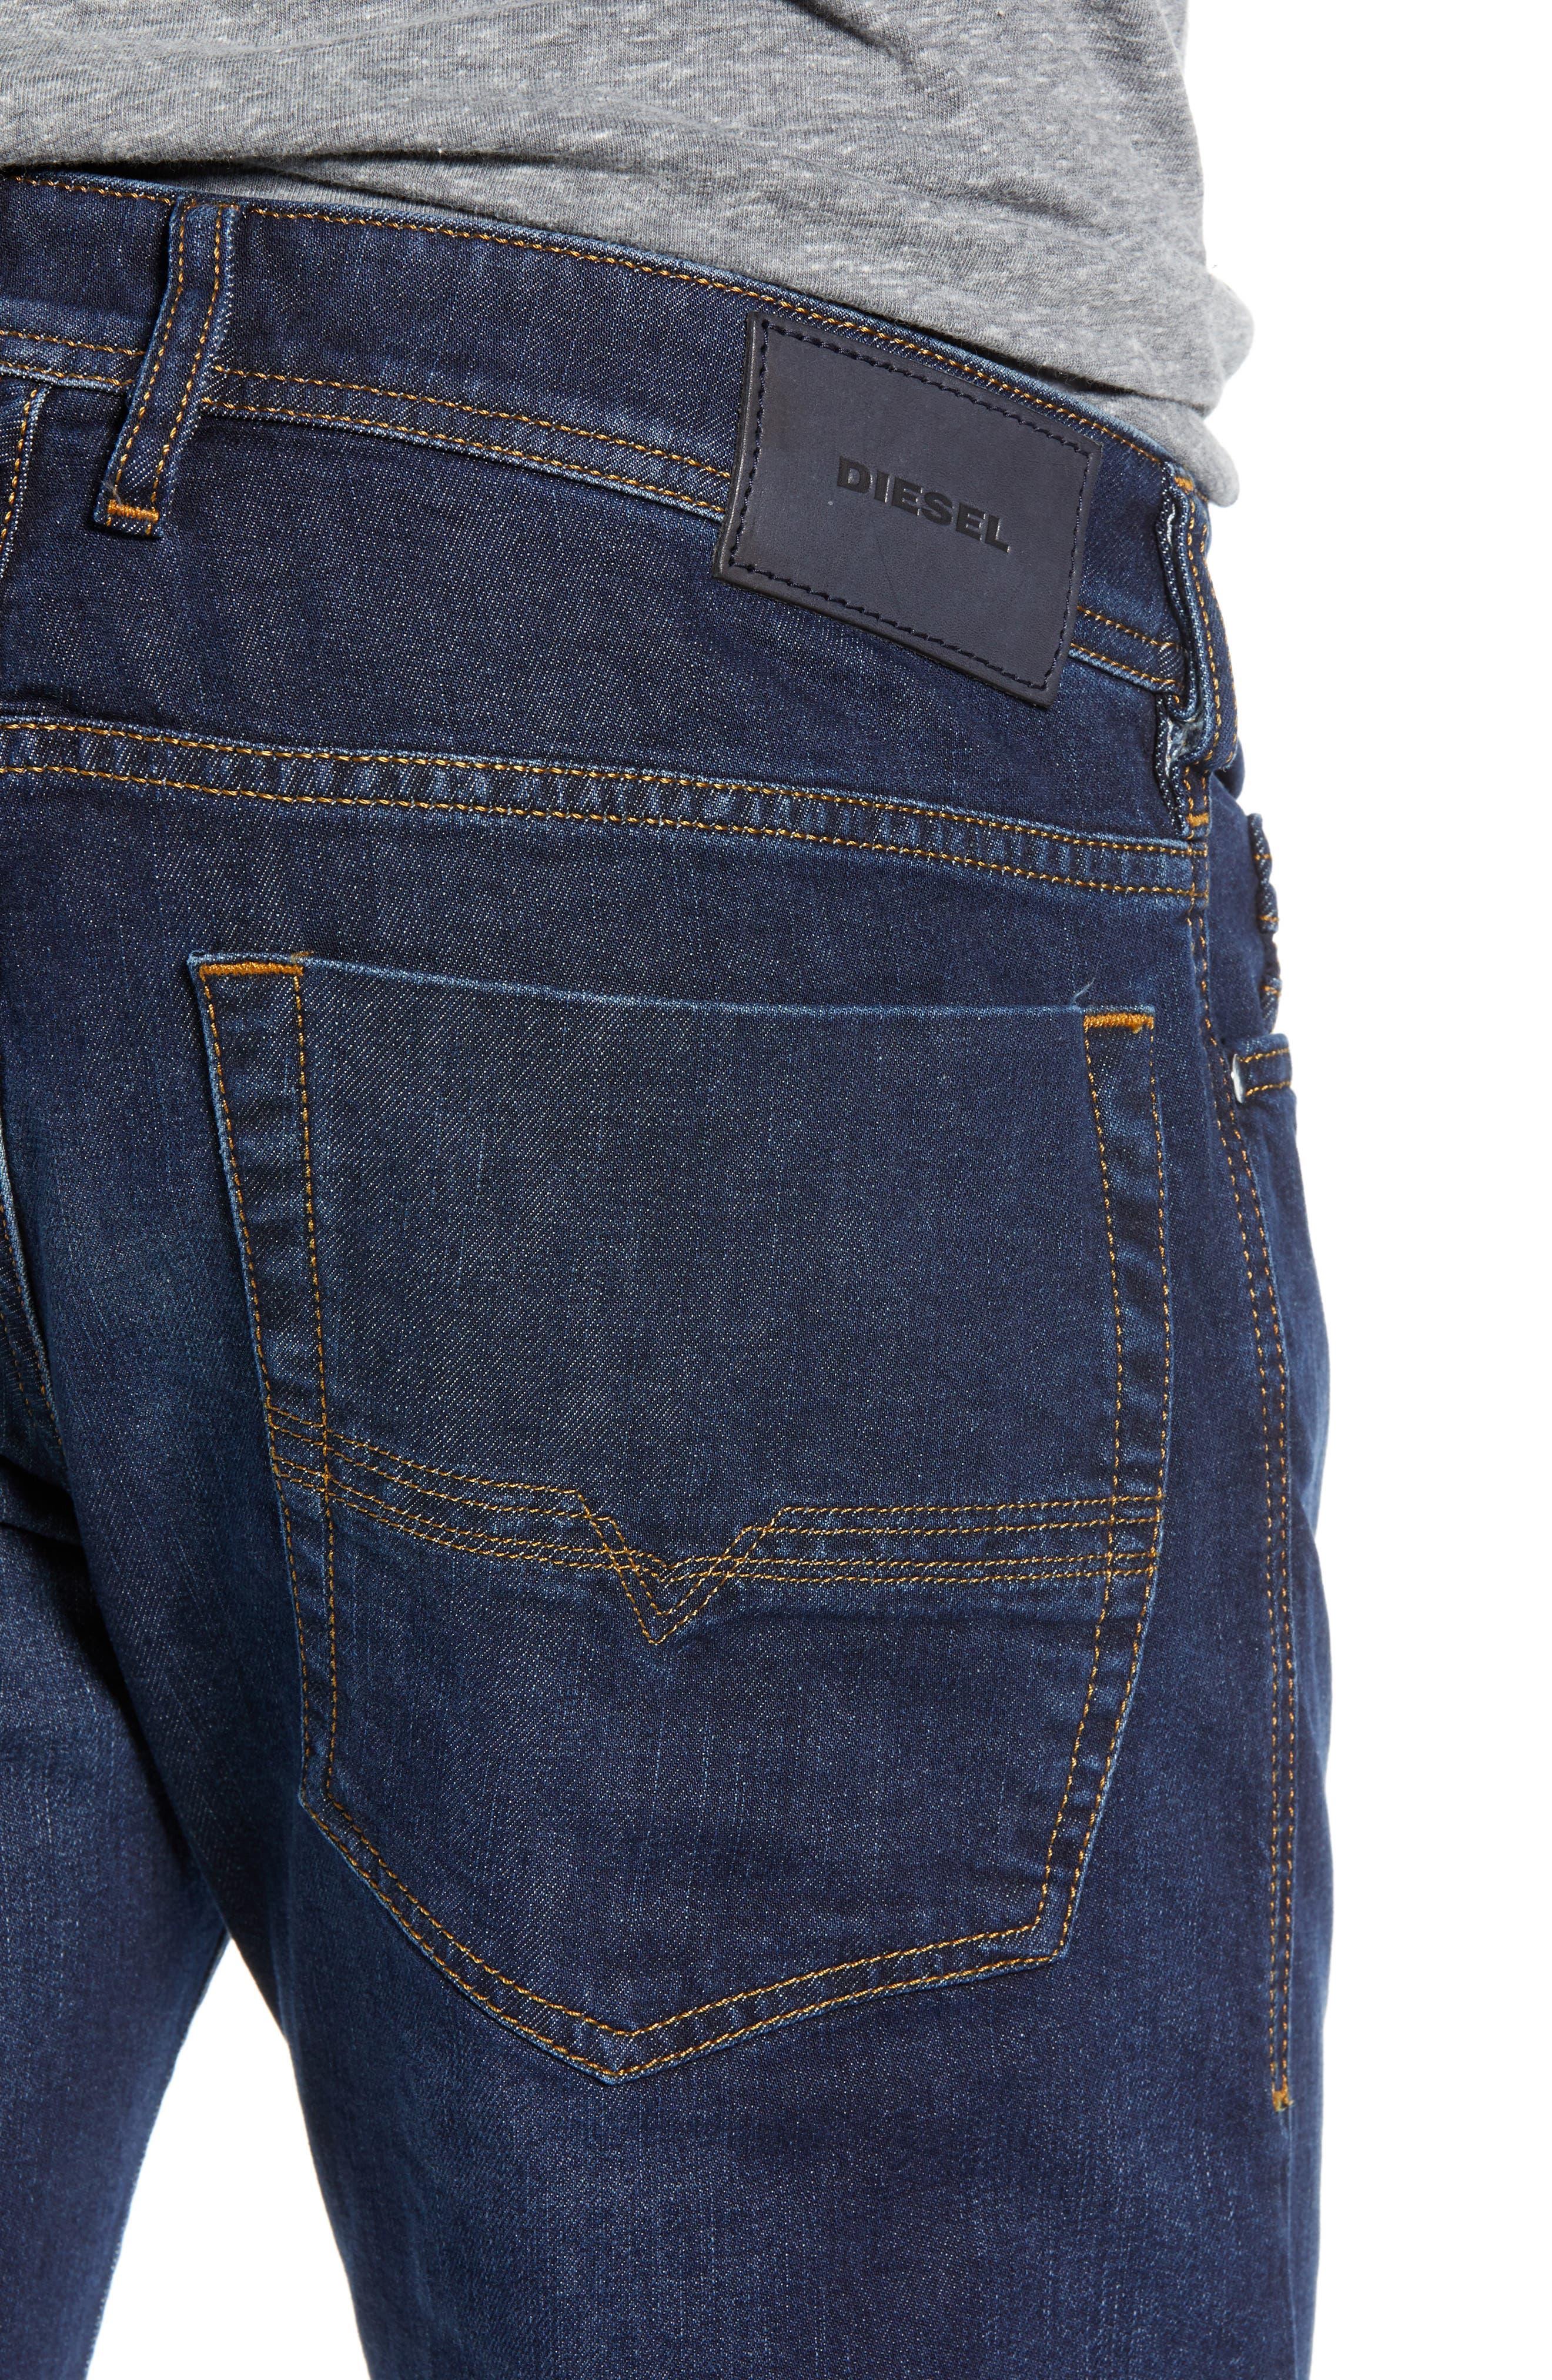 Zatiny Bootcut Jeans,                             Alternate thumbnail 4, color,                             084XH